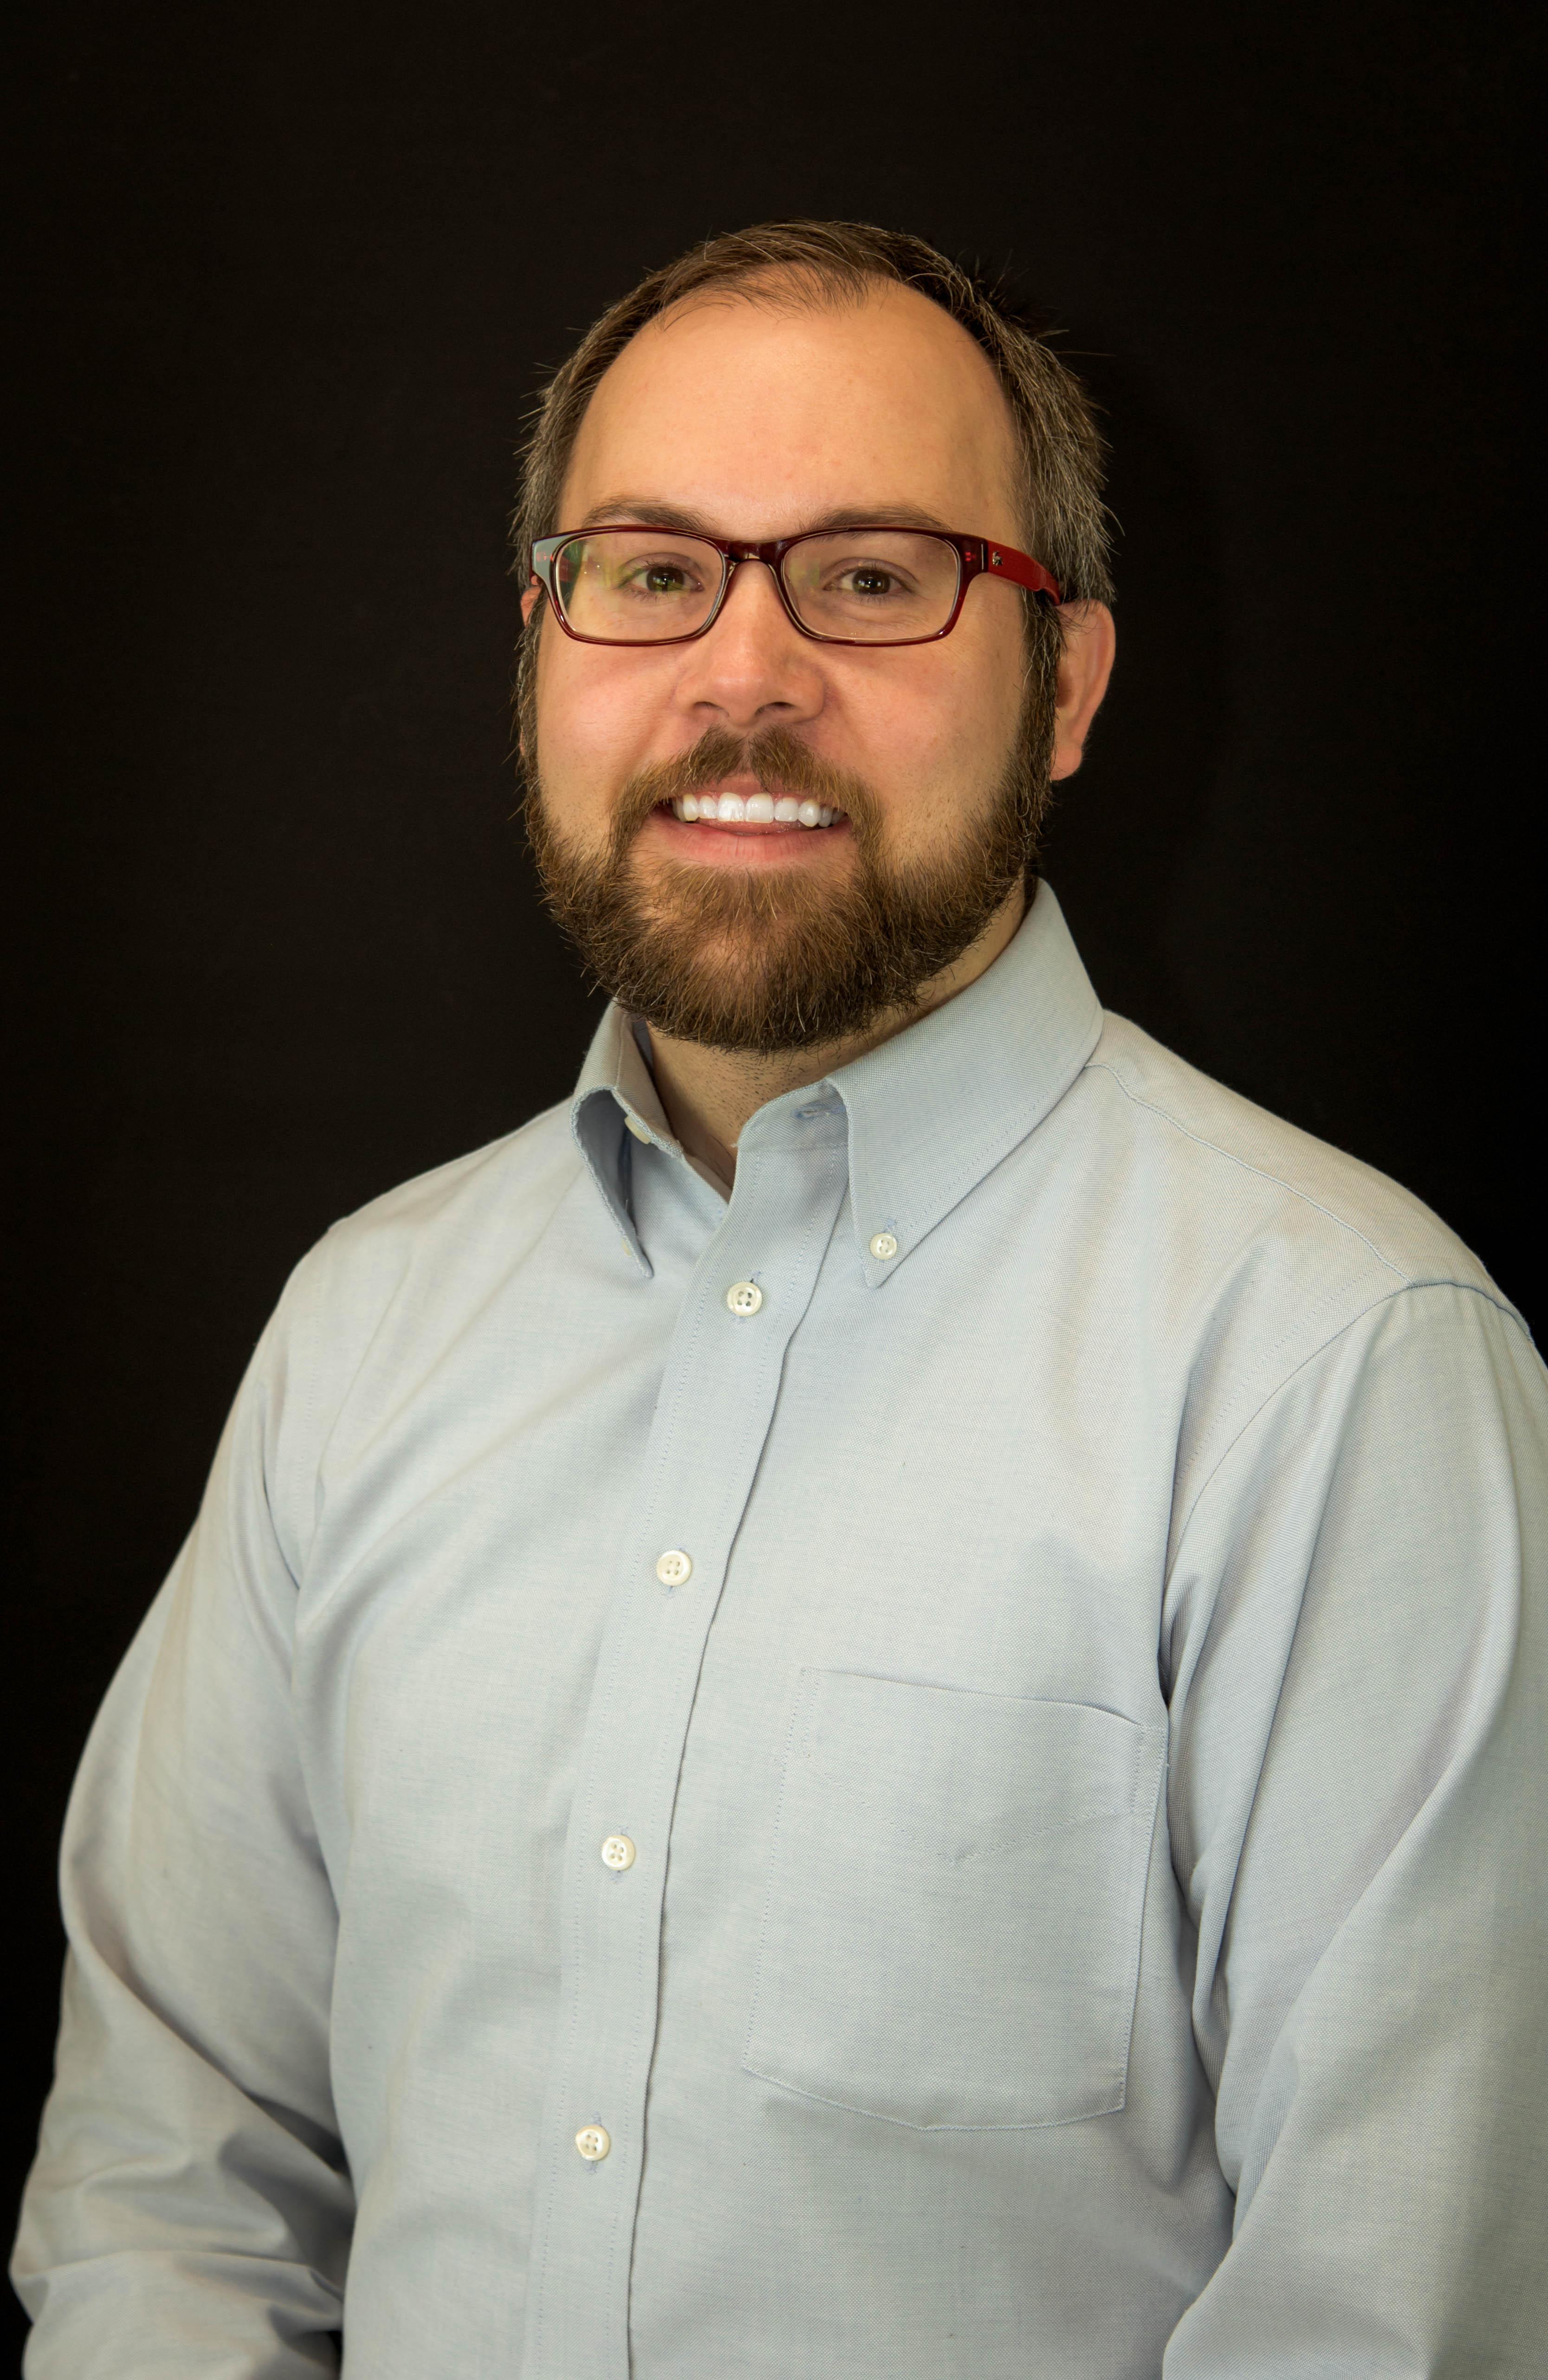 Eric Hartkopf, R.Ph.